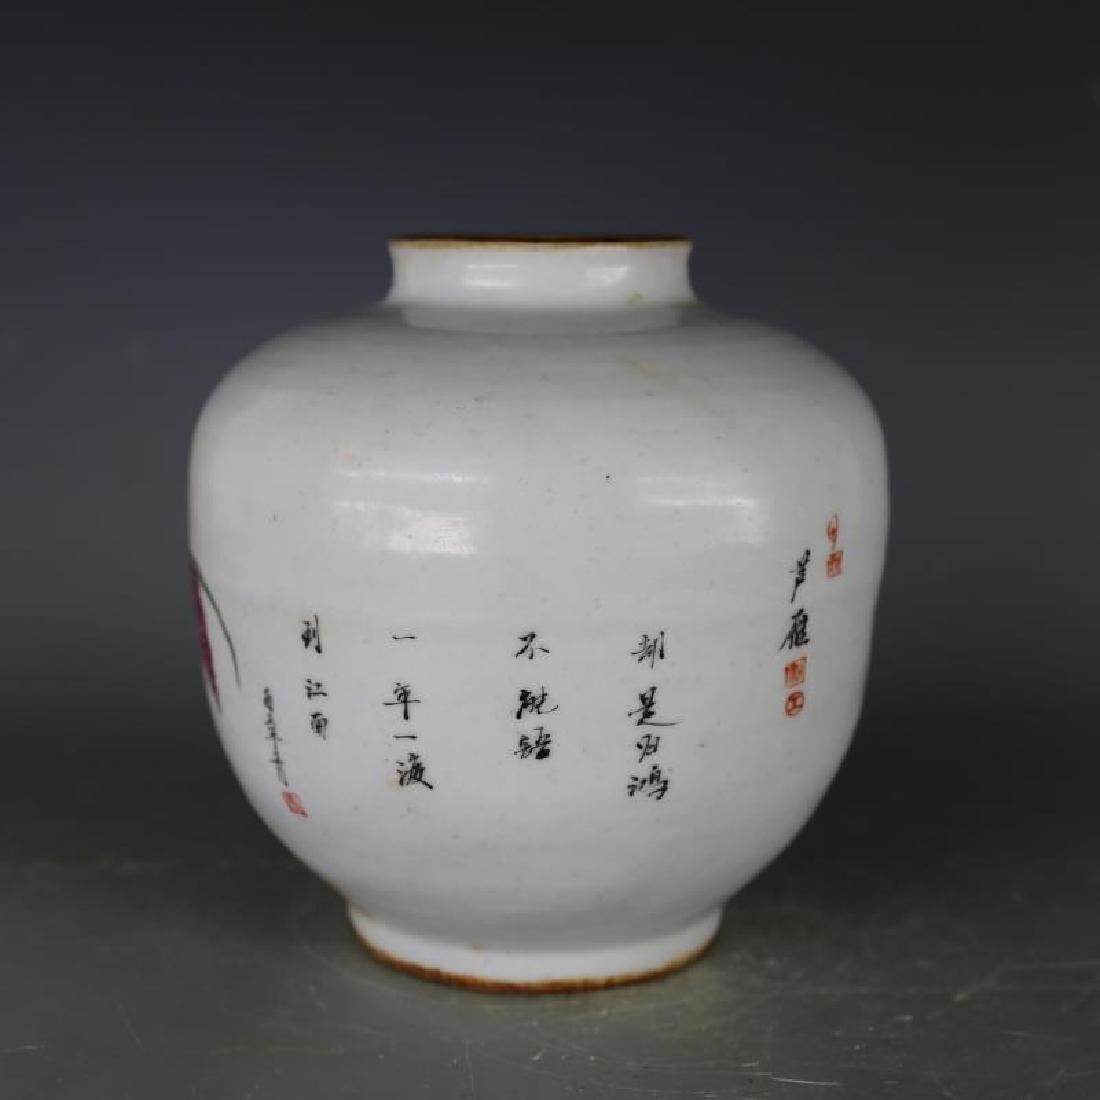 Chinese Qing Dynasty Famille-Rose Porcelain Jar - 6